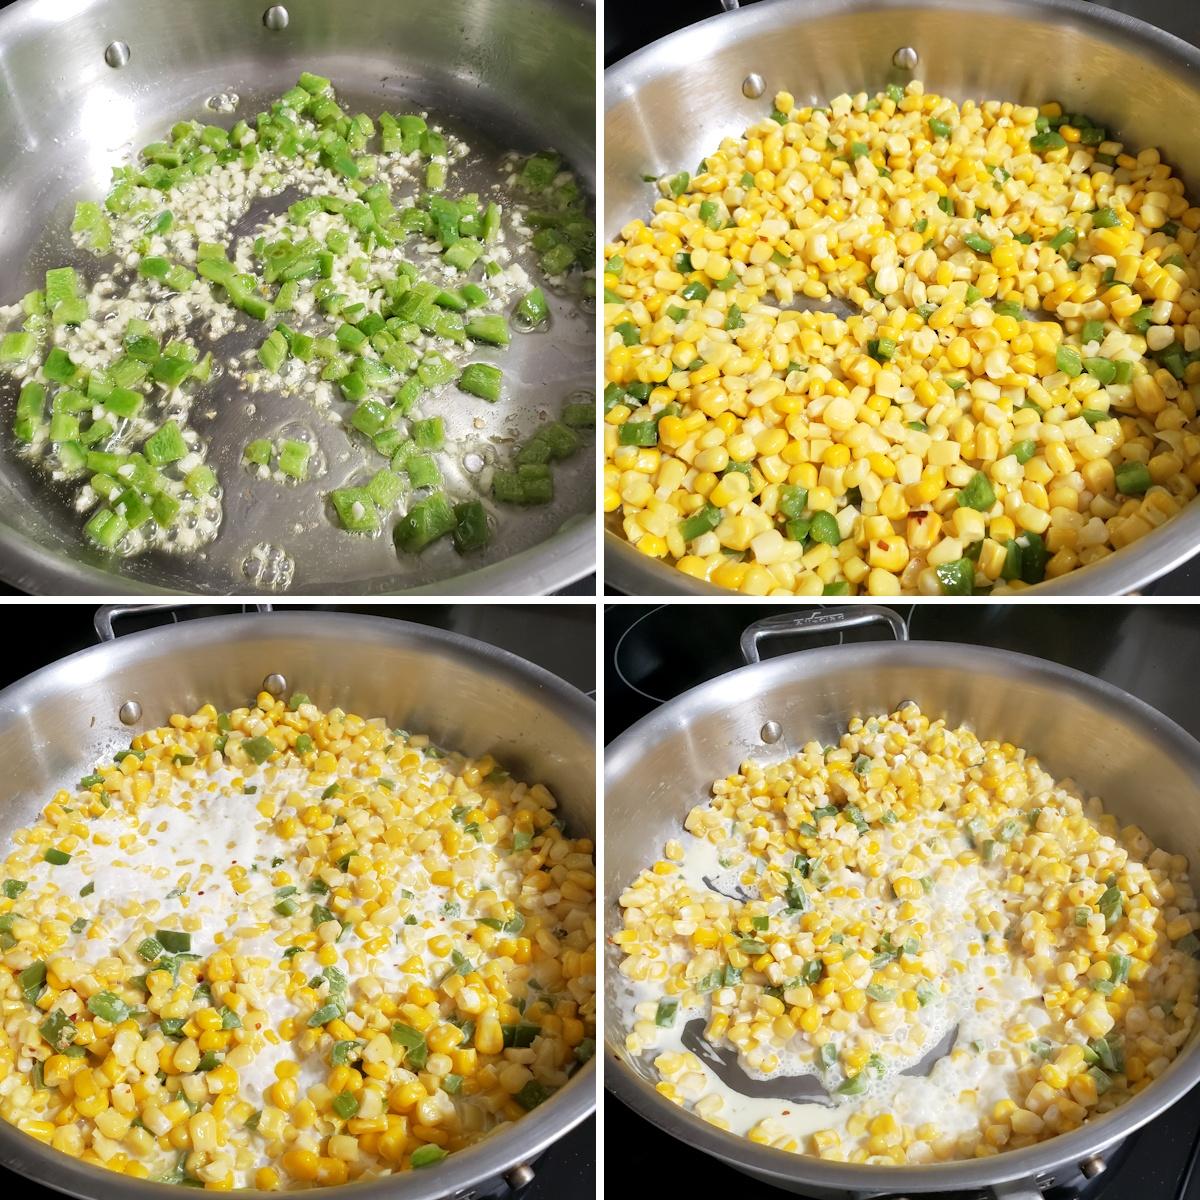 Cooking corn and jalapeños in a saute pan.